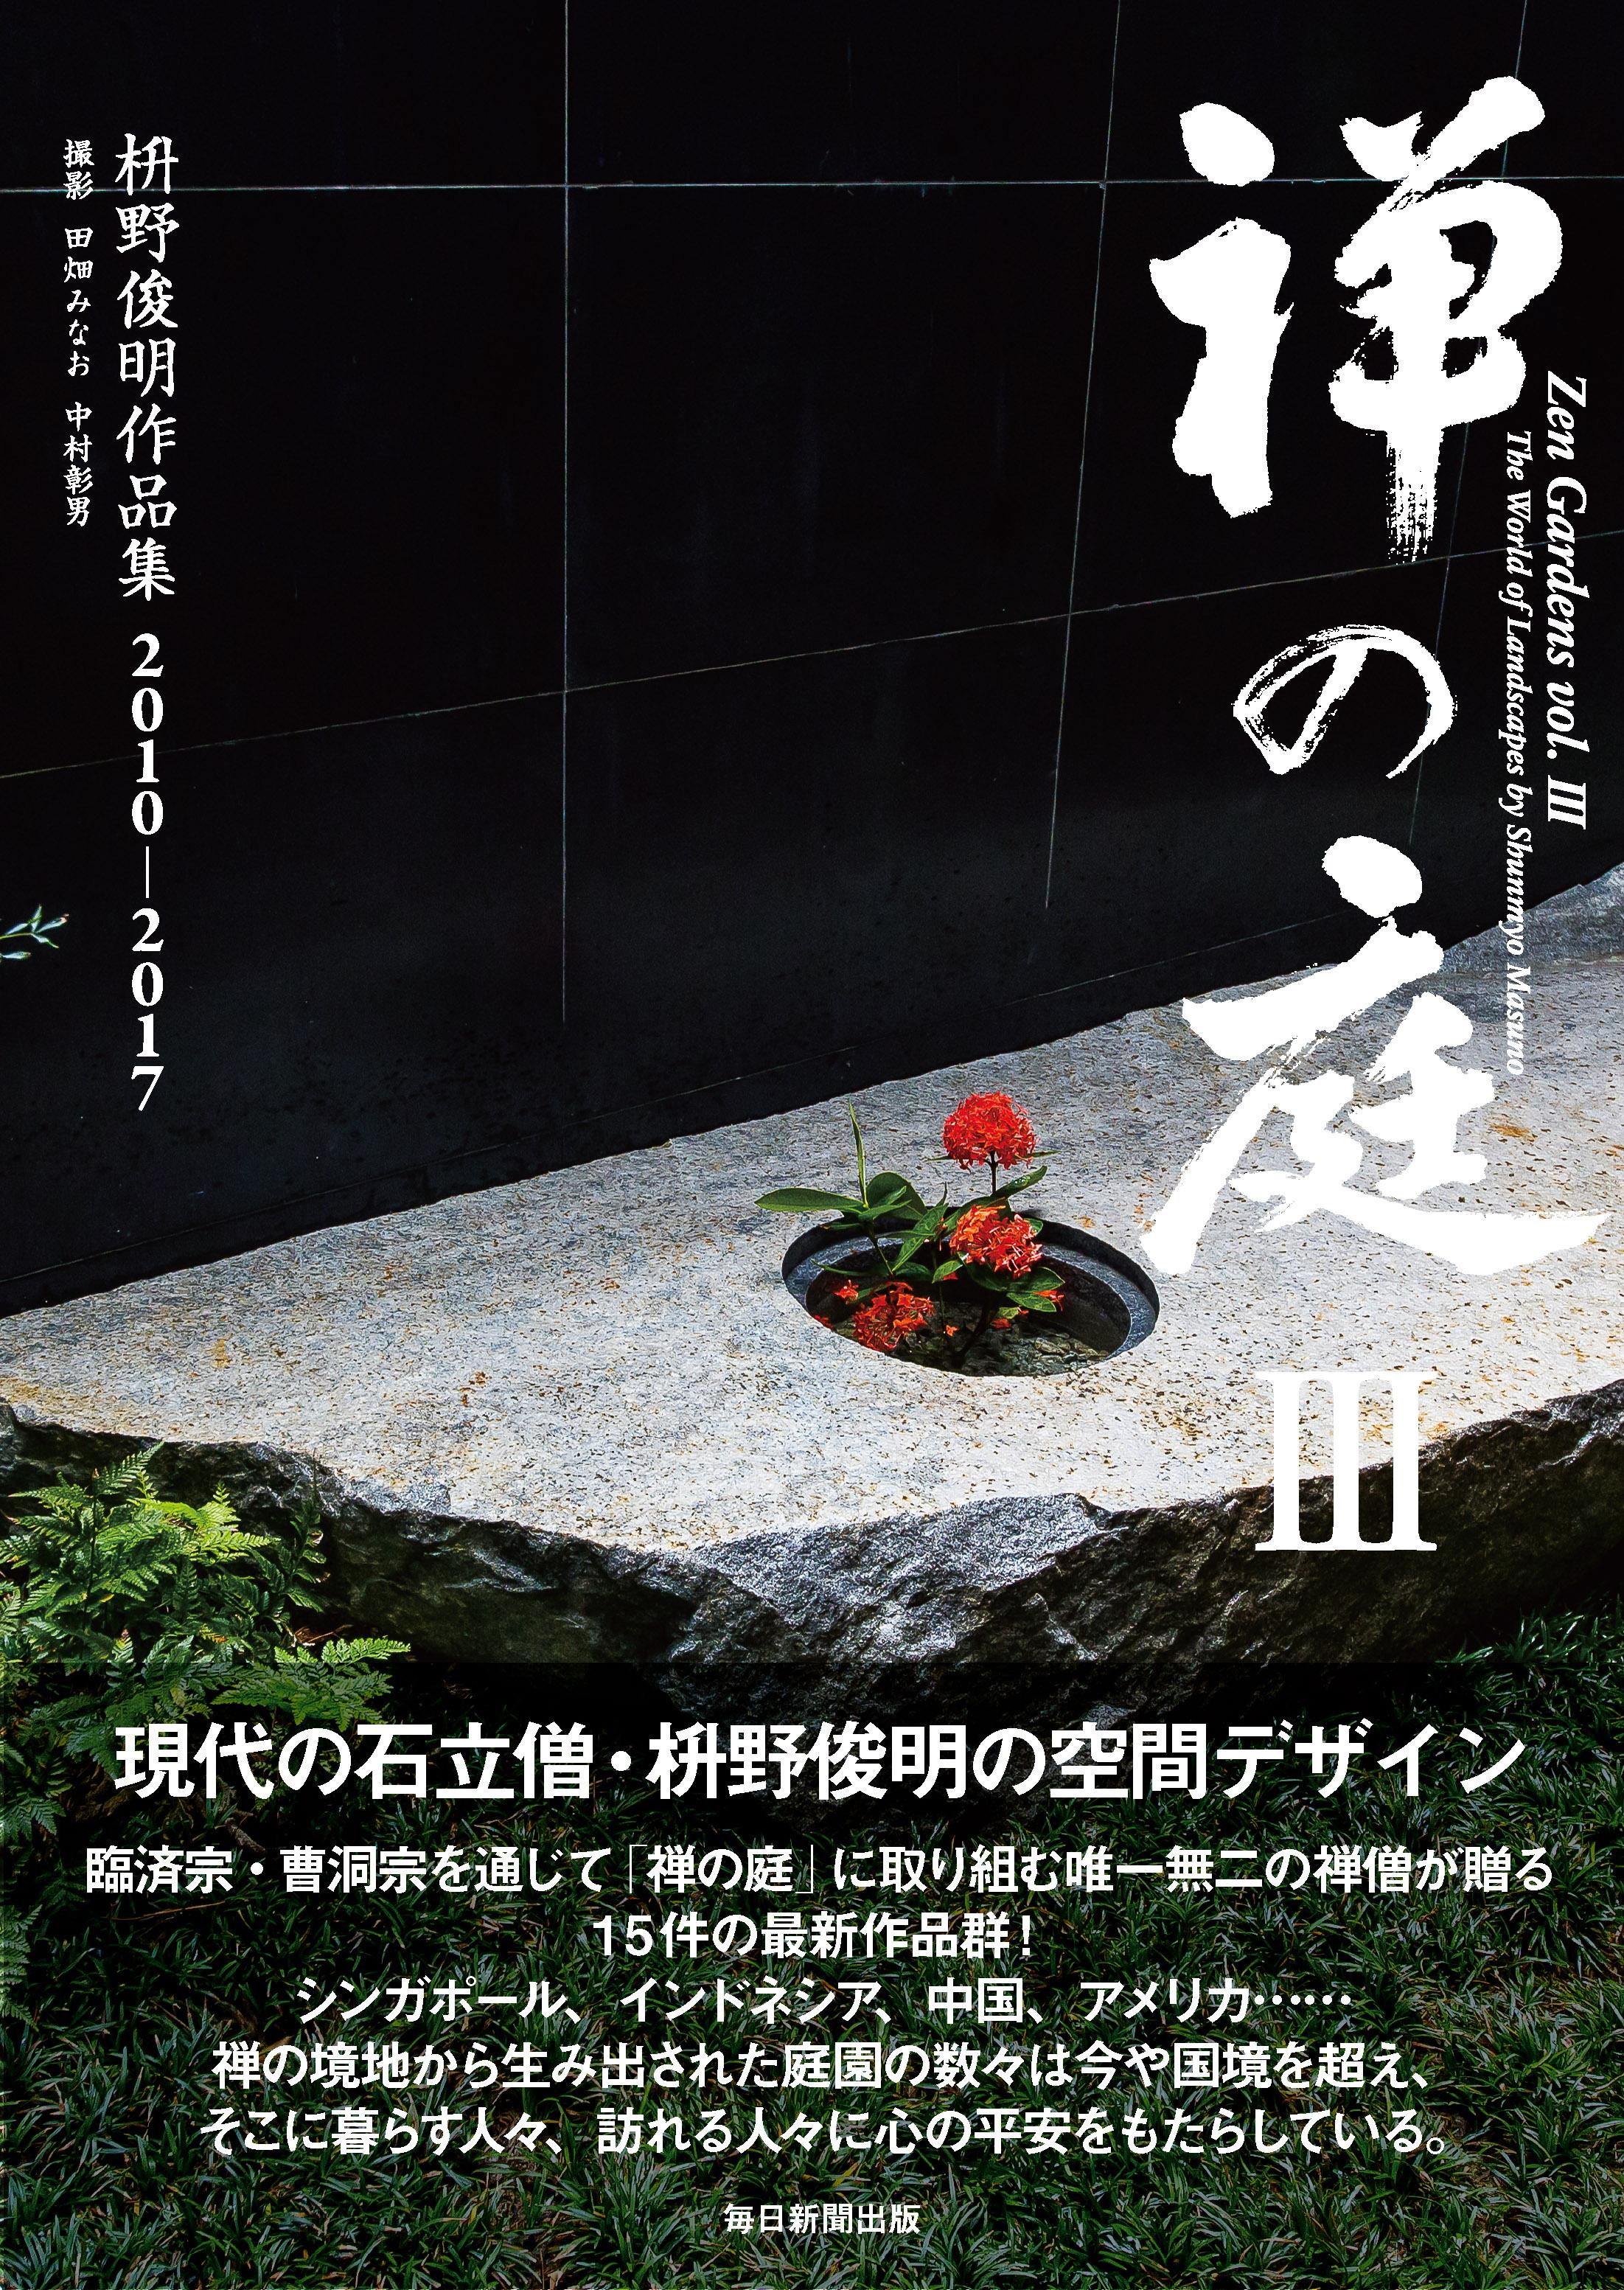 書影:禅の庭Ⅲ 枡野俊明作品集2010~2017